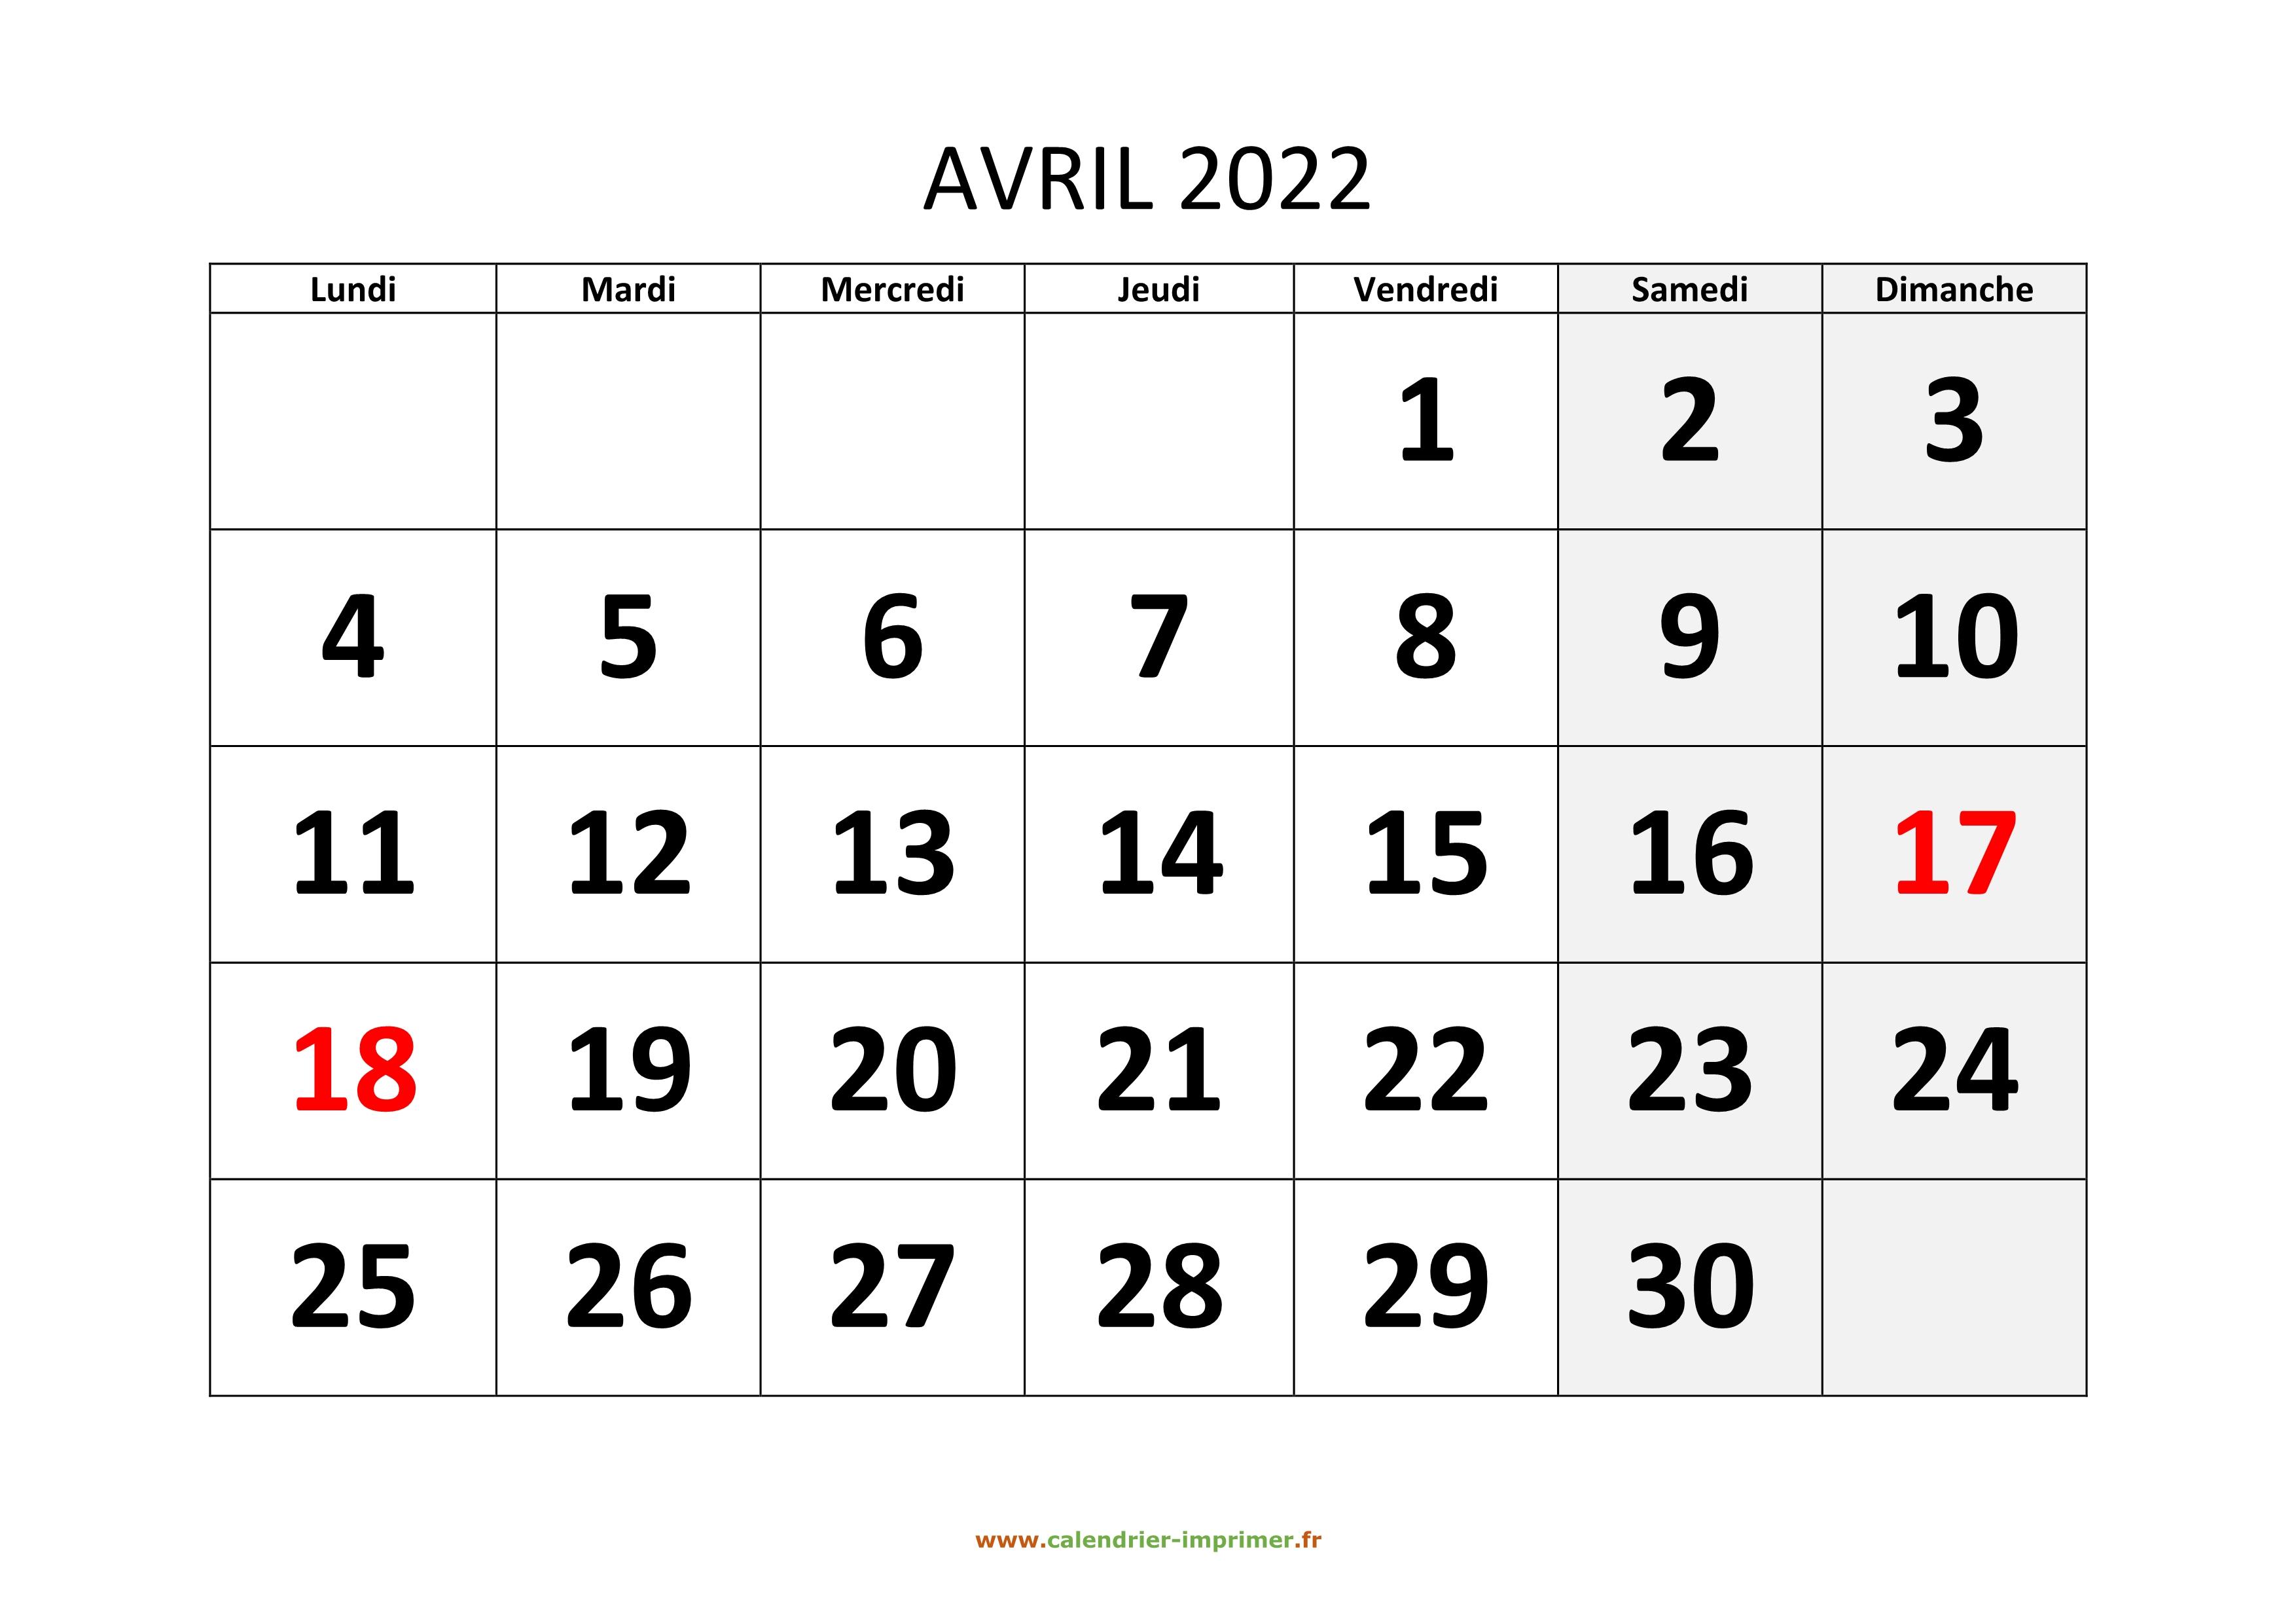 Avril 2022 Calendrier Calendrier Avril 2022 à imprimer